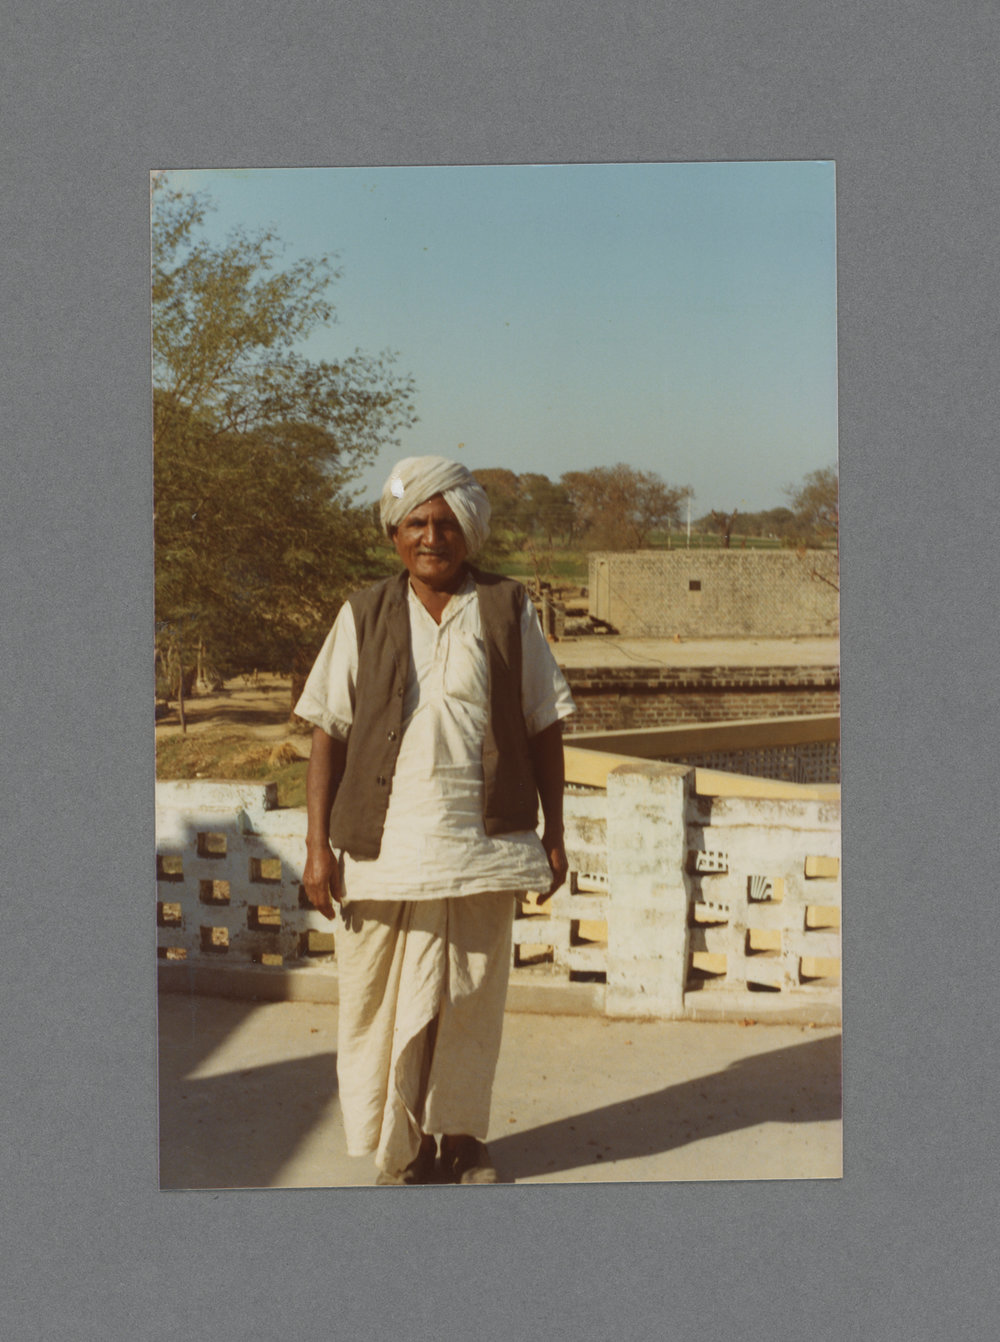 Punjab, India c.1979